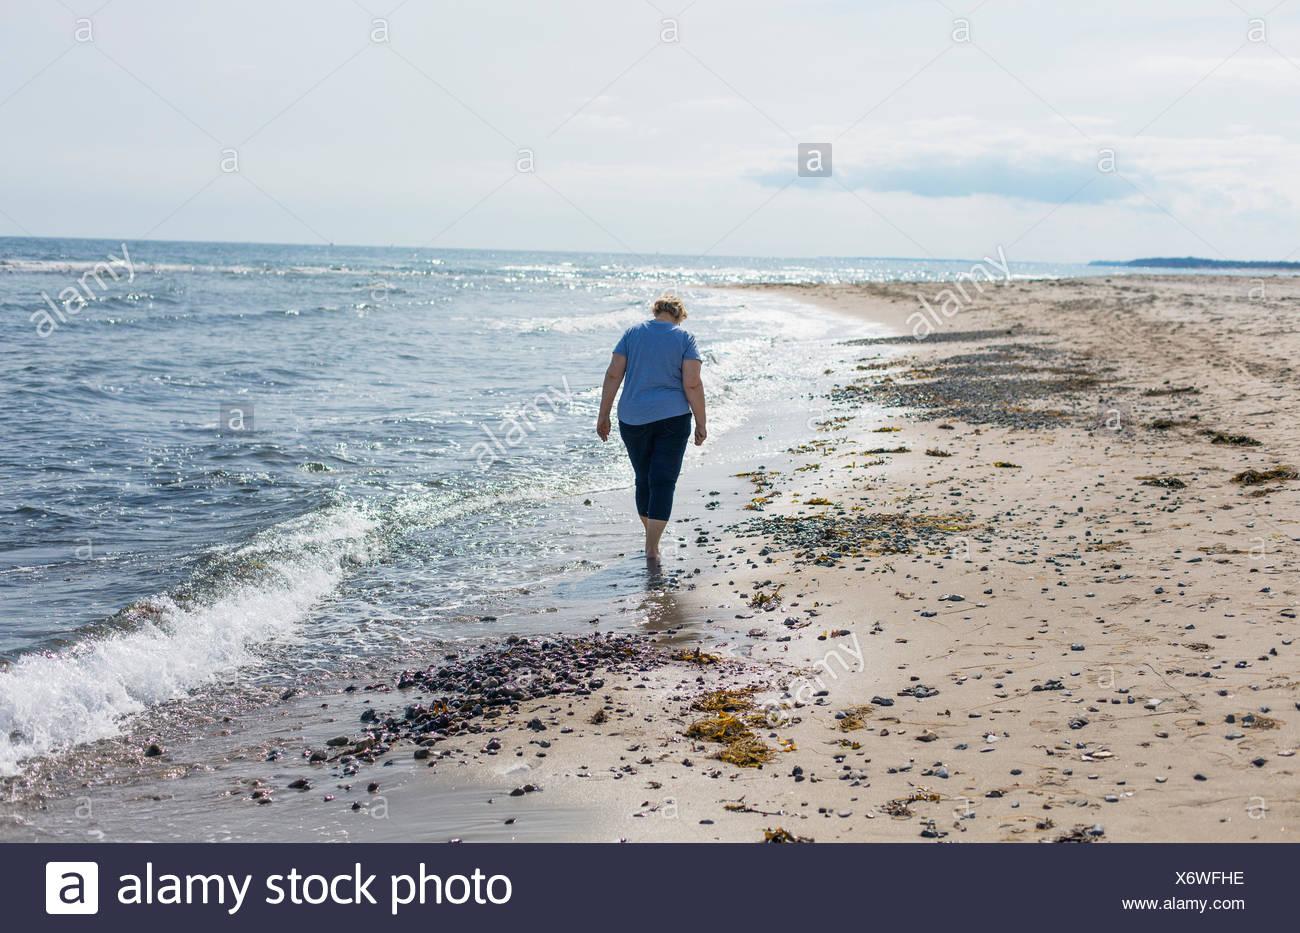 Denmark, North Zealand, Woman walking on beach - Stock Image